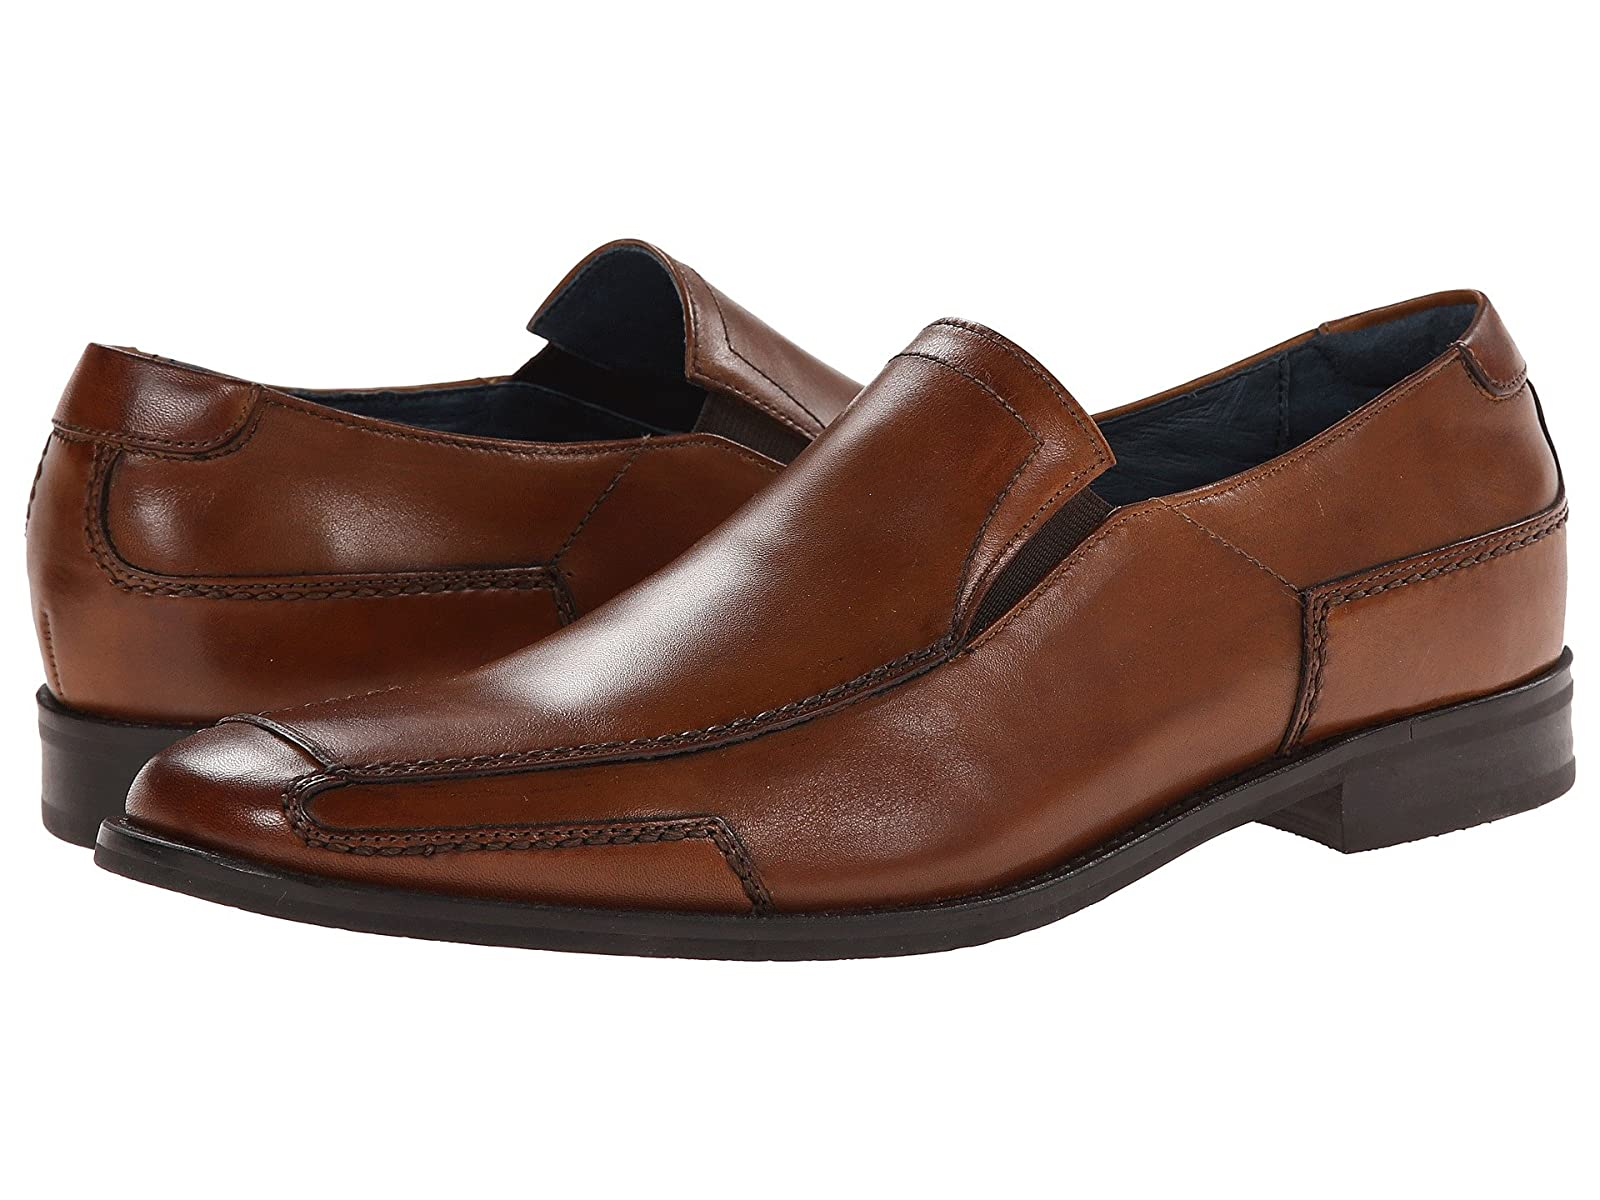 RUSH by Gordon Rush Shaw (14)Cheap and distinctive eye-catching shoes